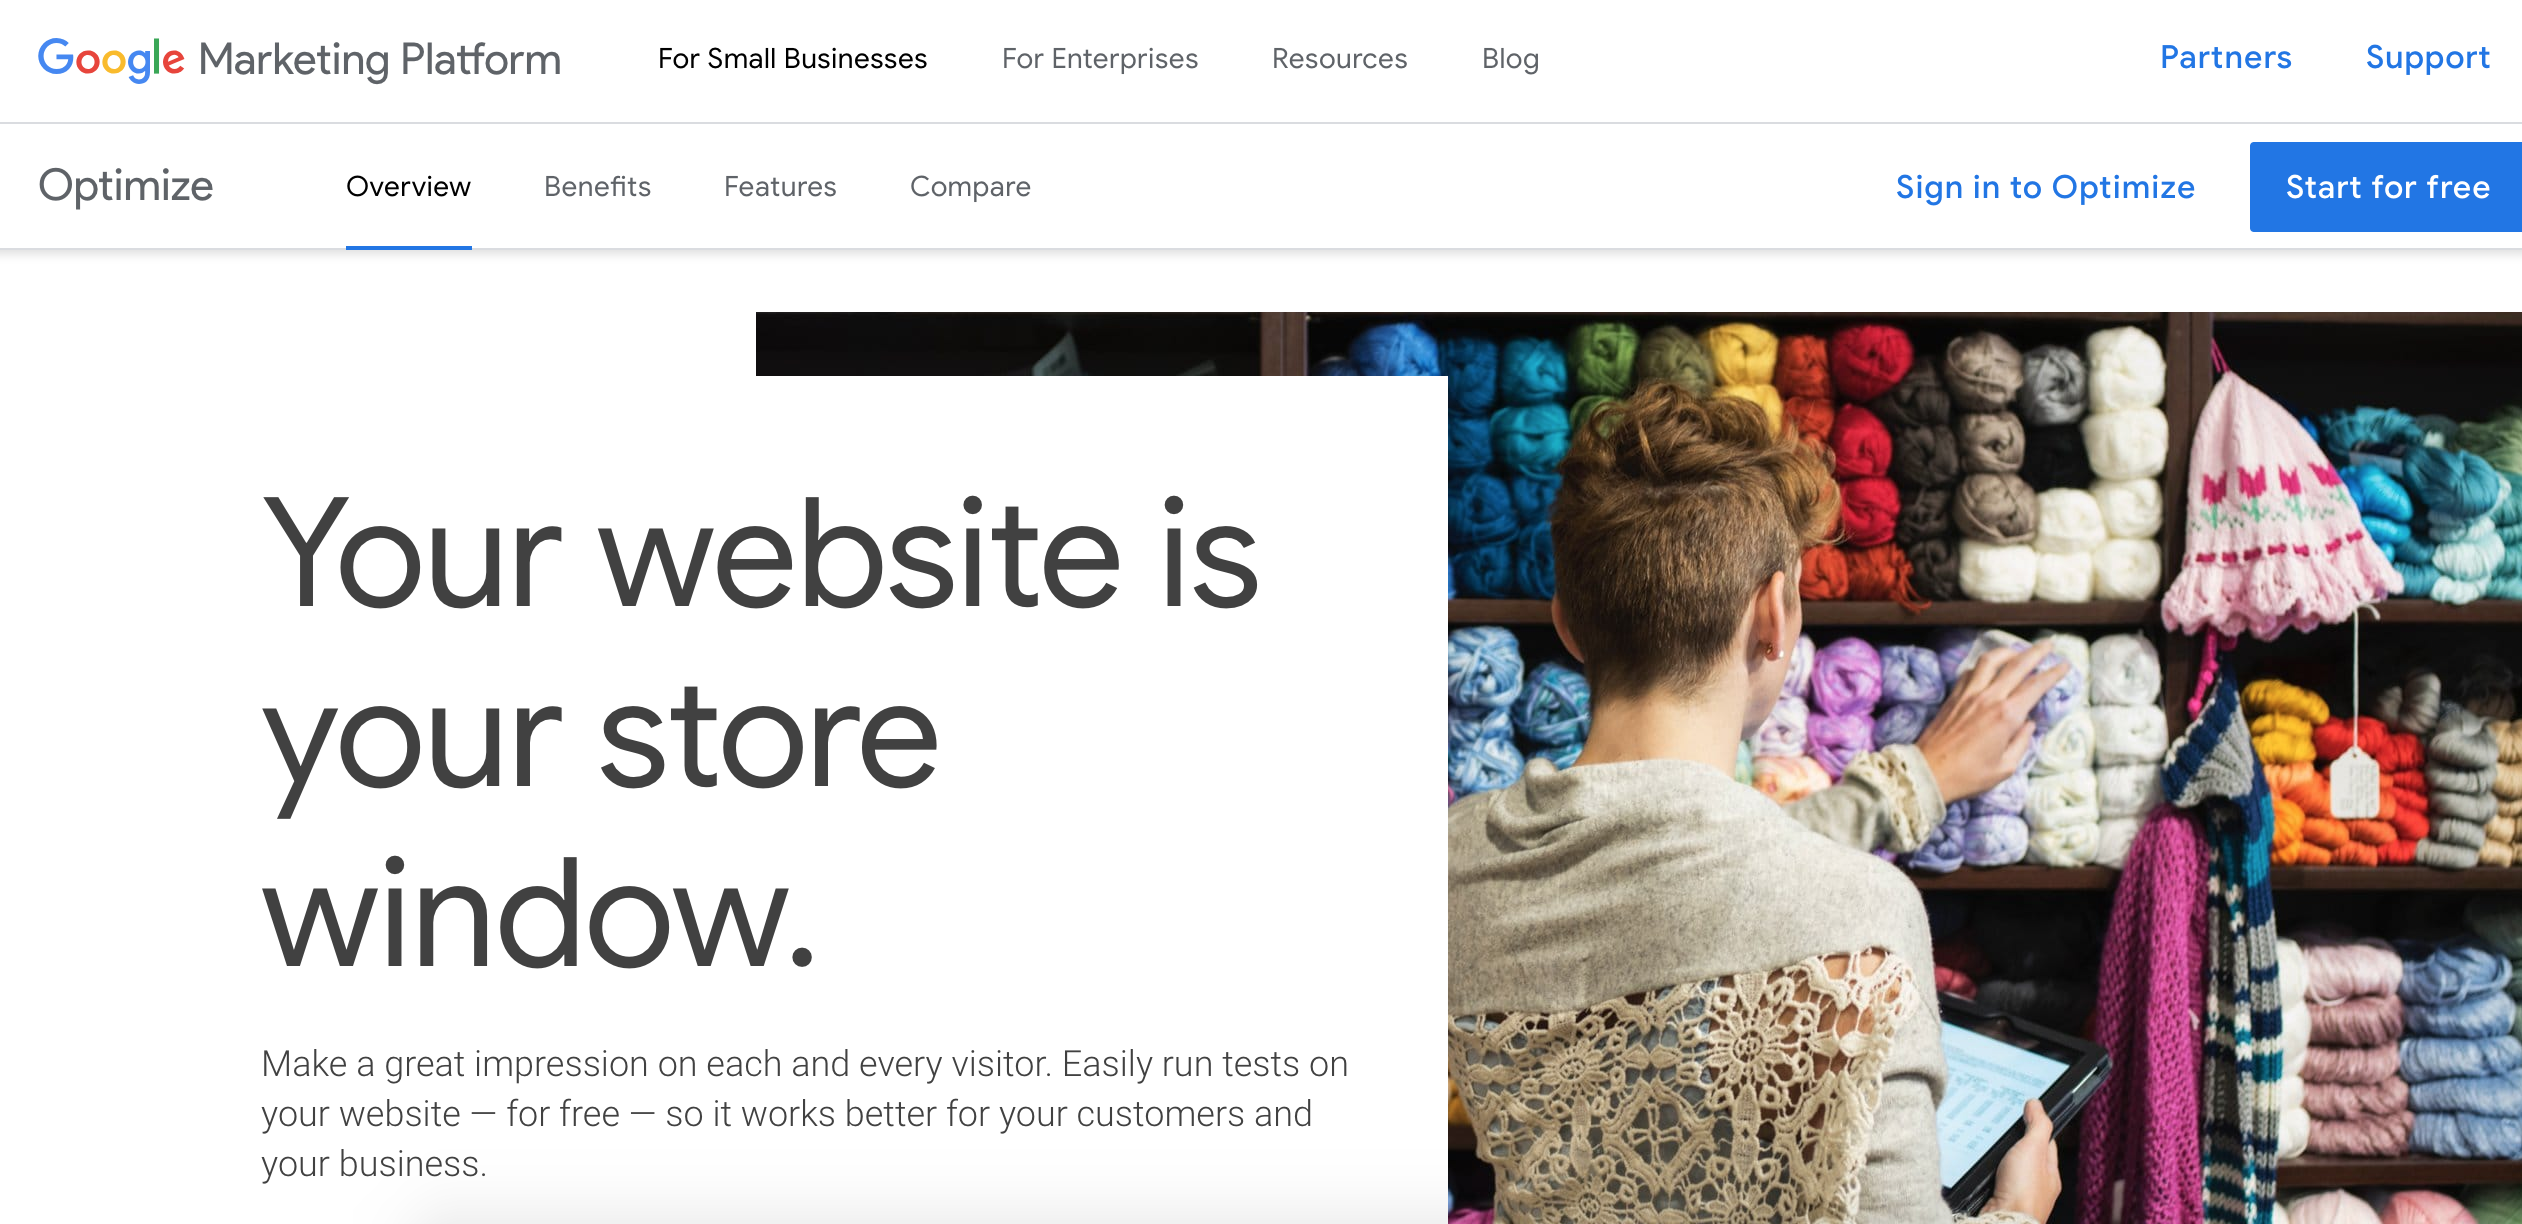 Google Optimize is part of Google's Marketing Platform